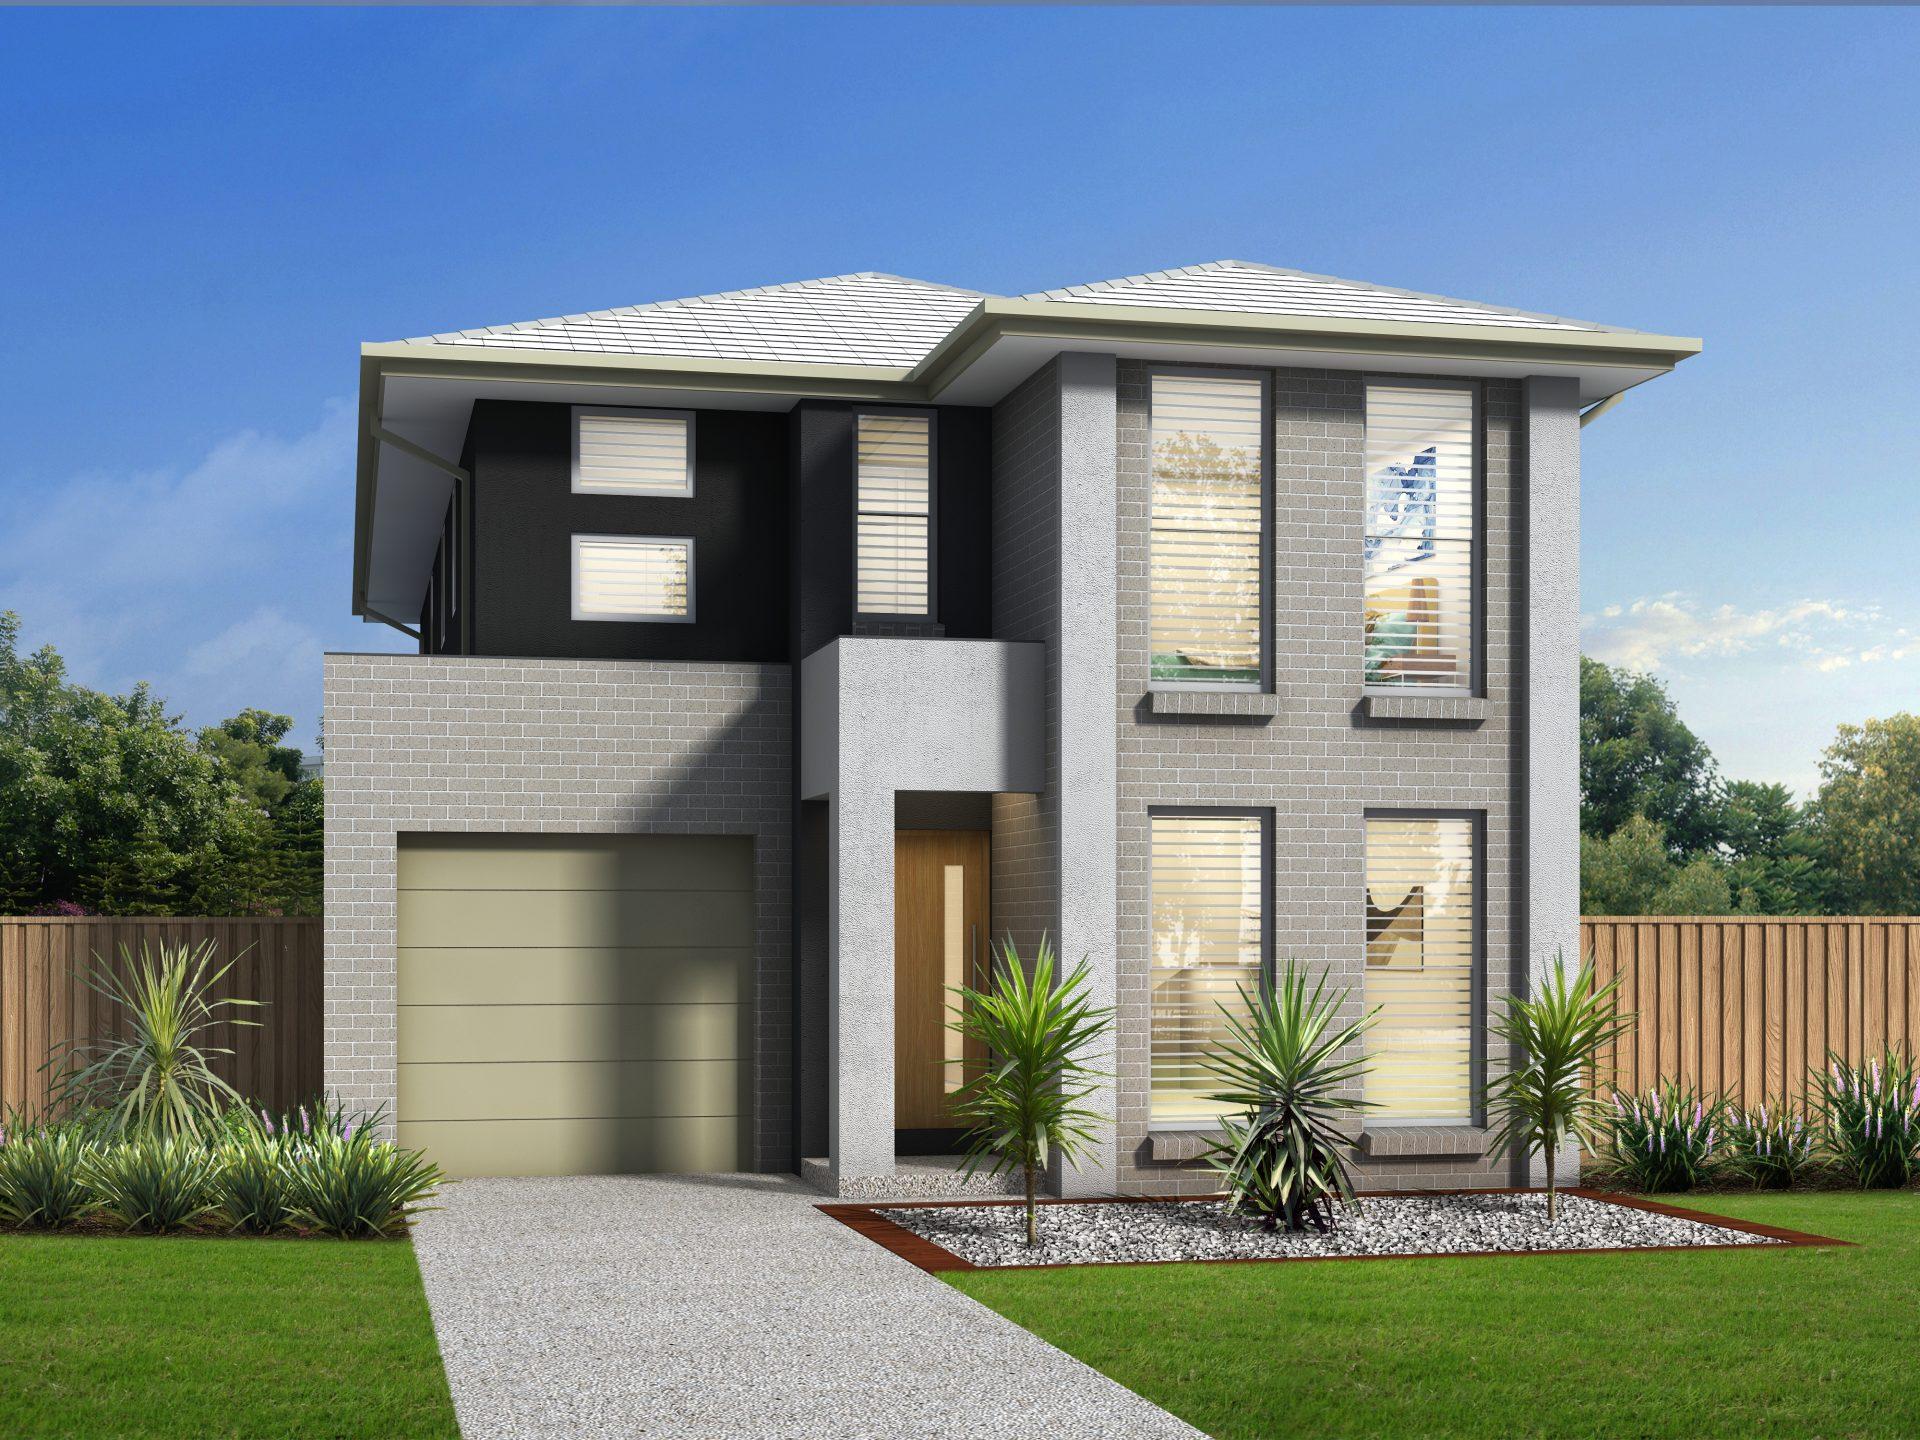 3633-stellar-home-facade-6393-22-trend-single-garage-0823-fi